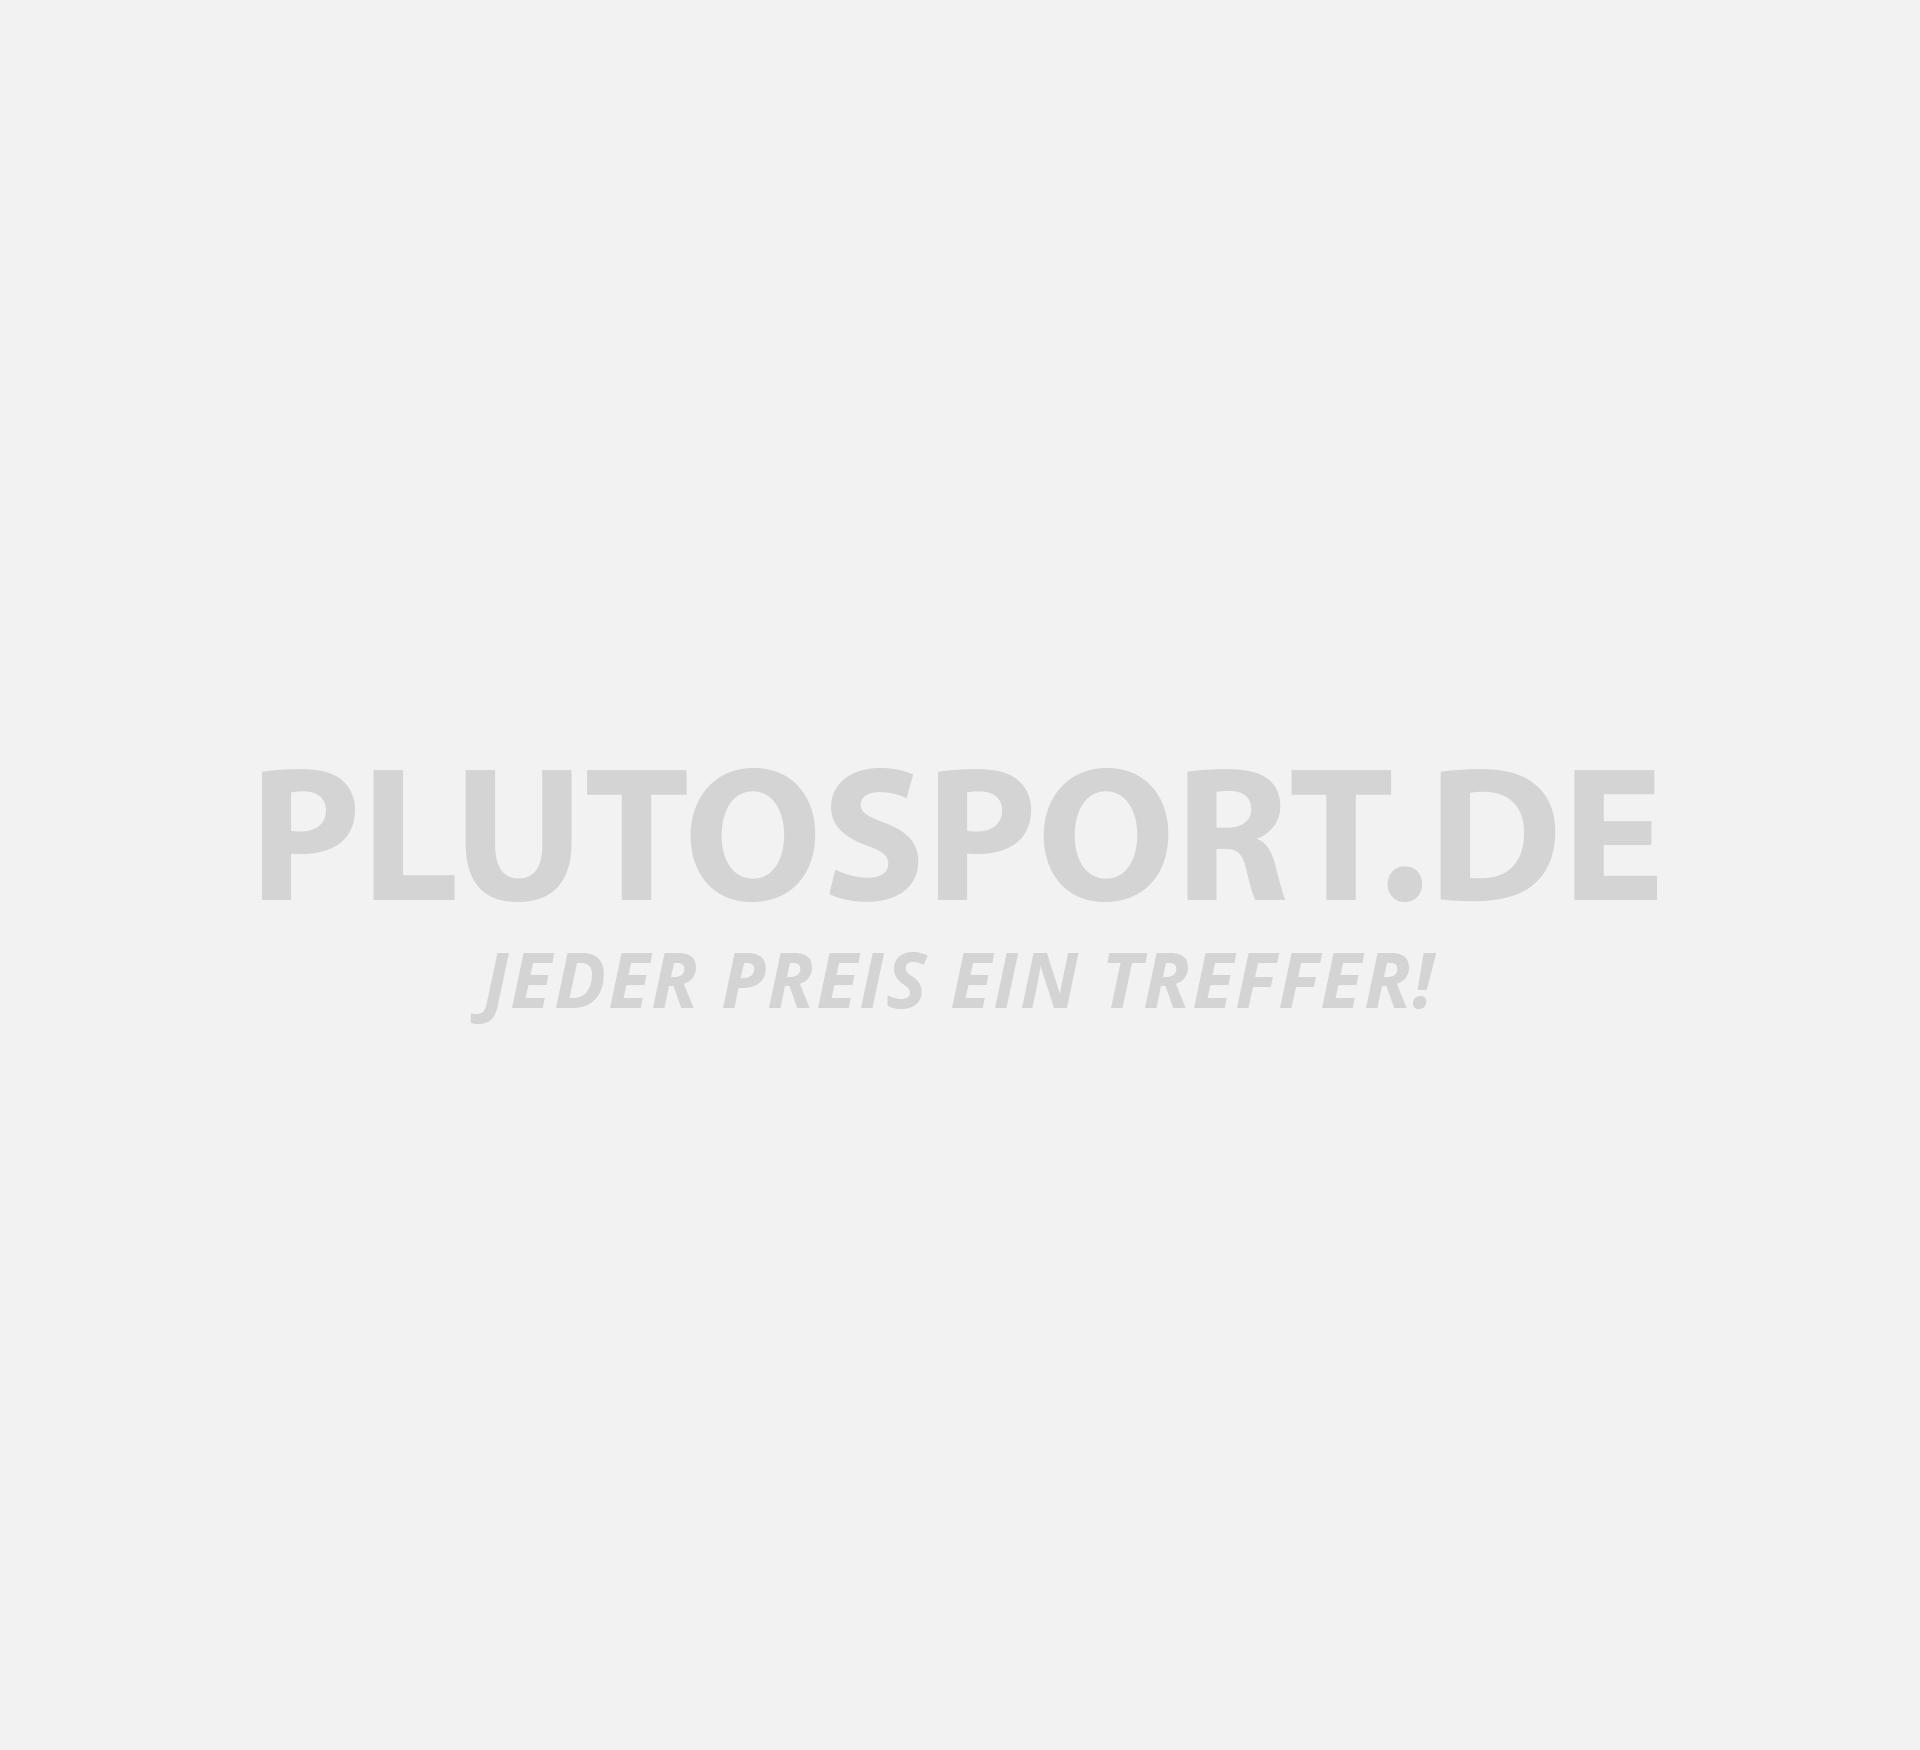 Hugo Boss Brief Boxershorts Herren (3er Pack)